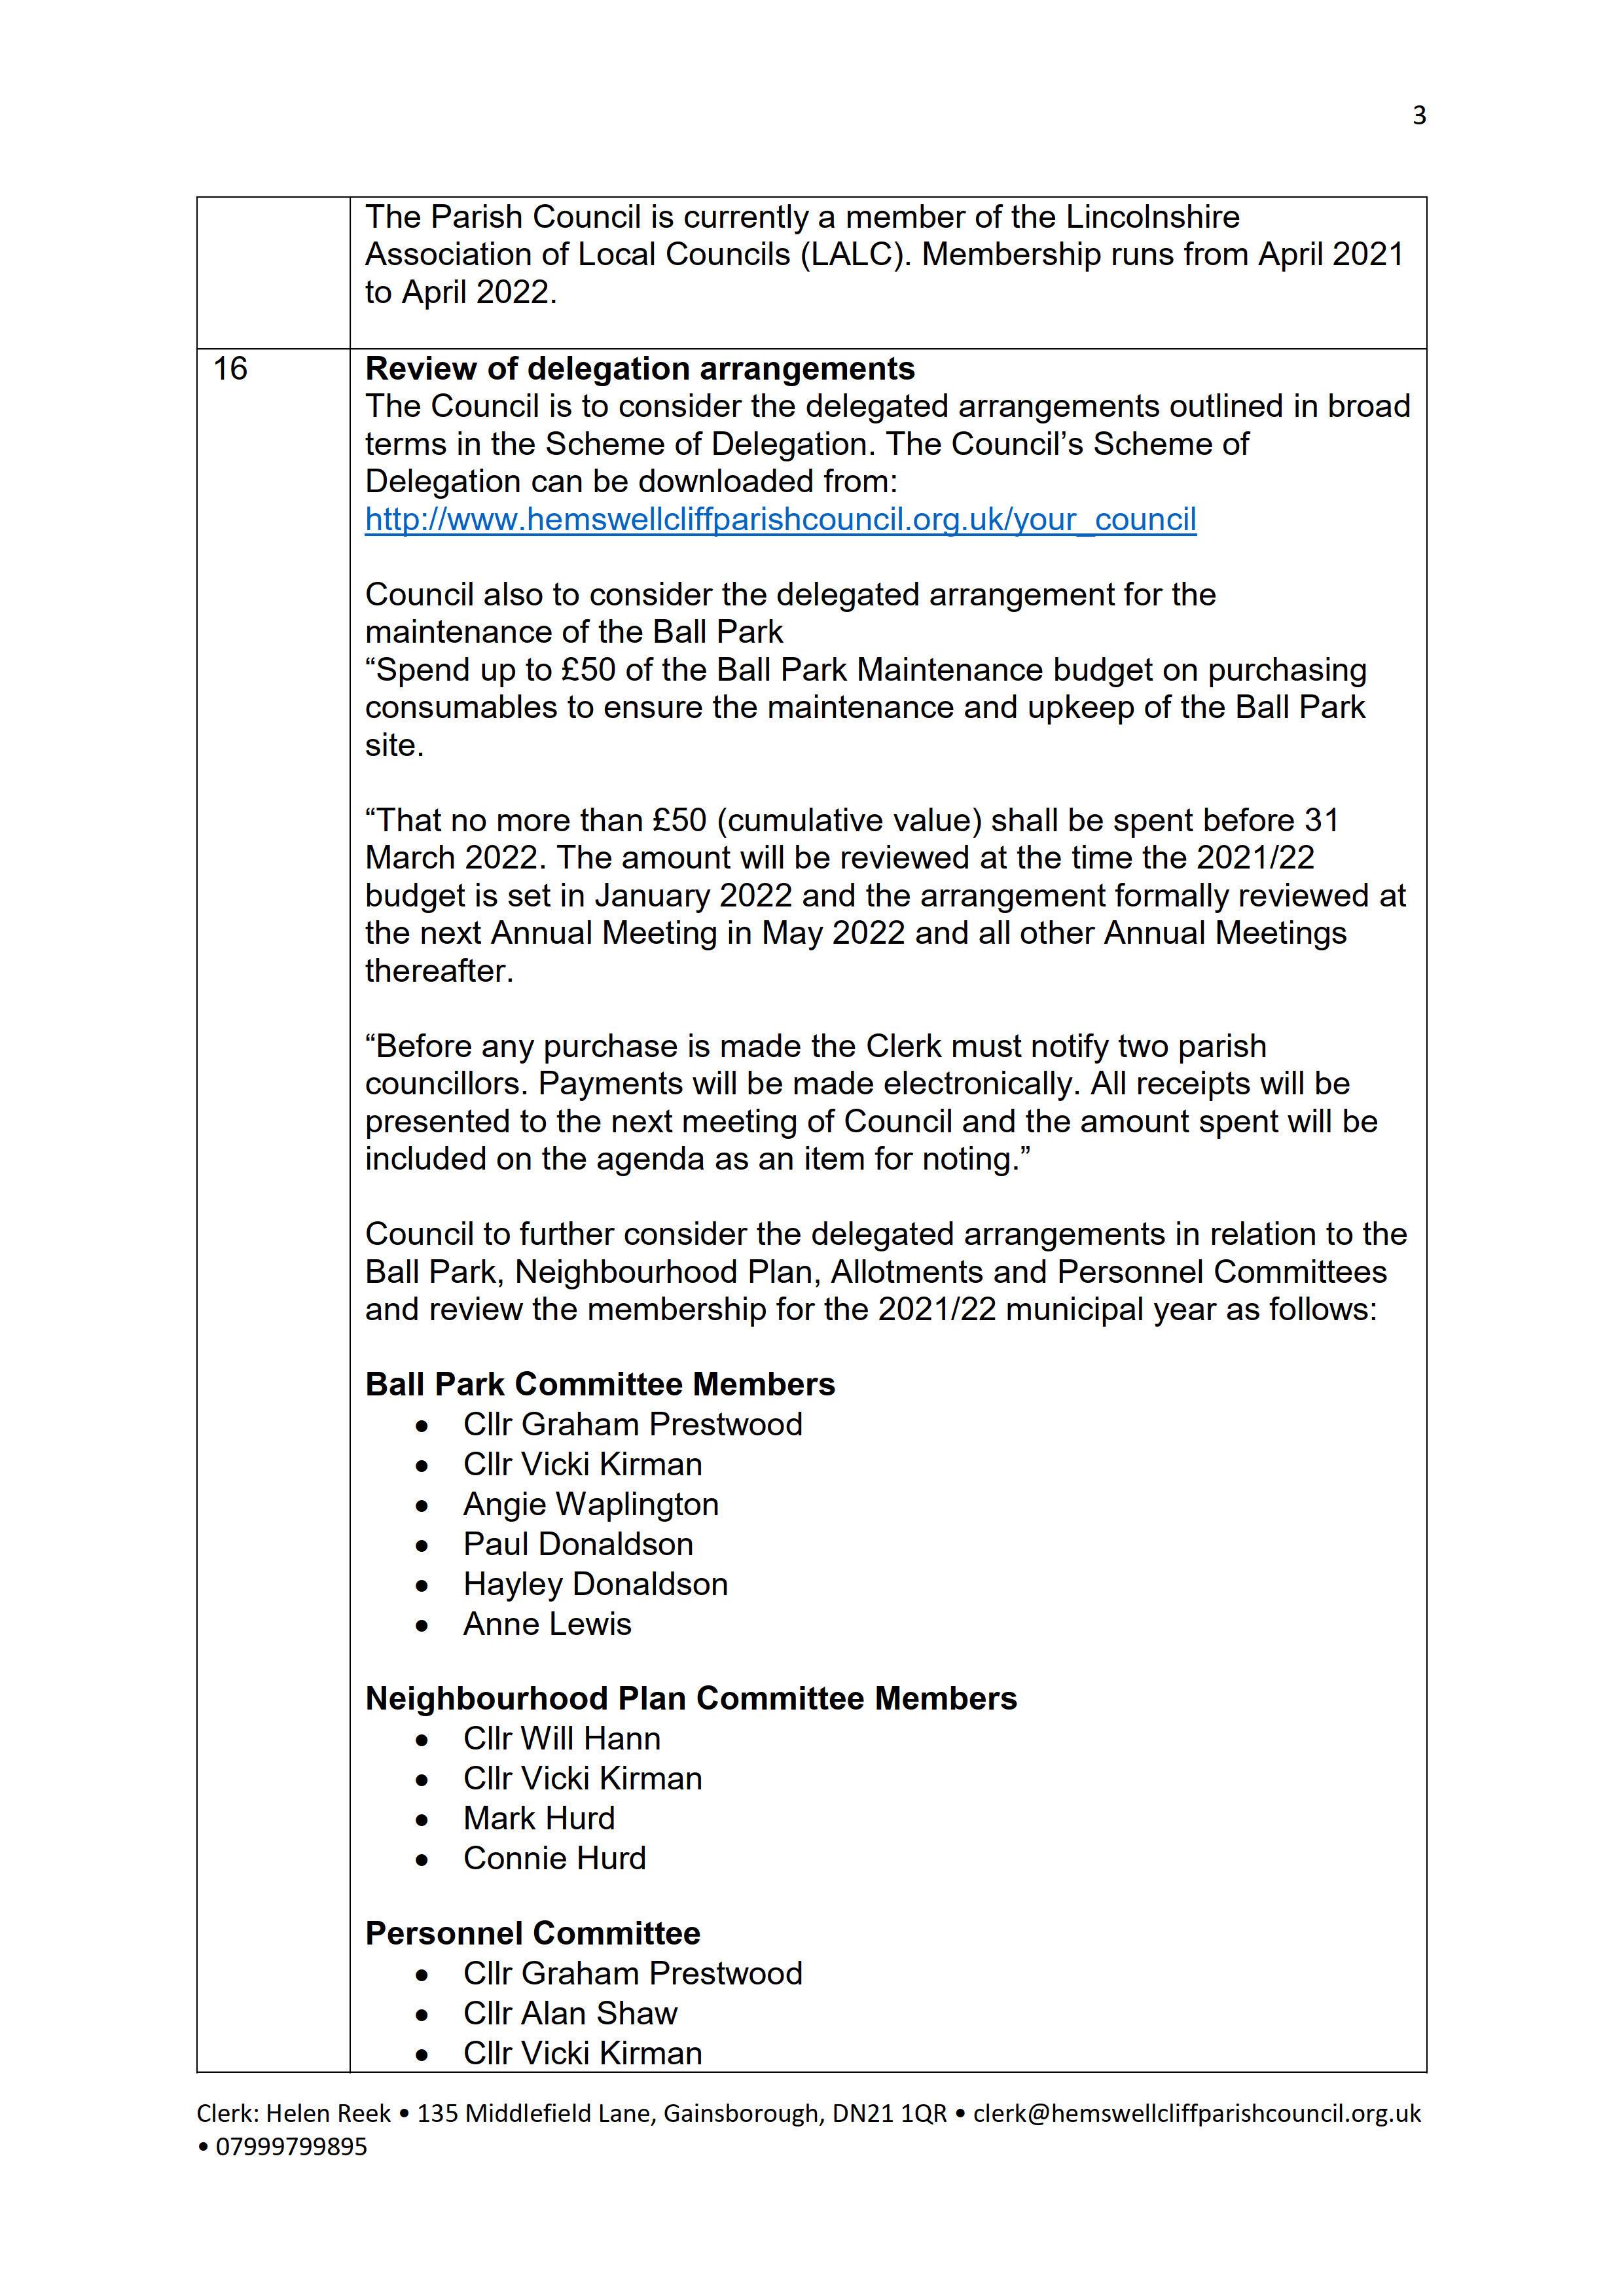 Annual_Meeting_Agenda_17.05.21_3.jpg